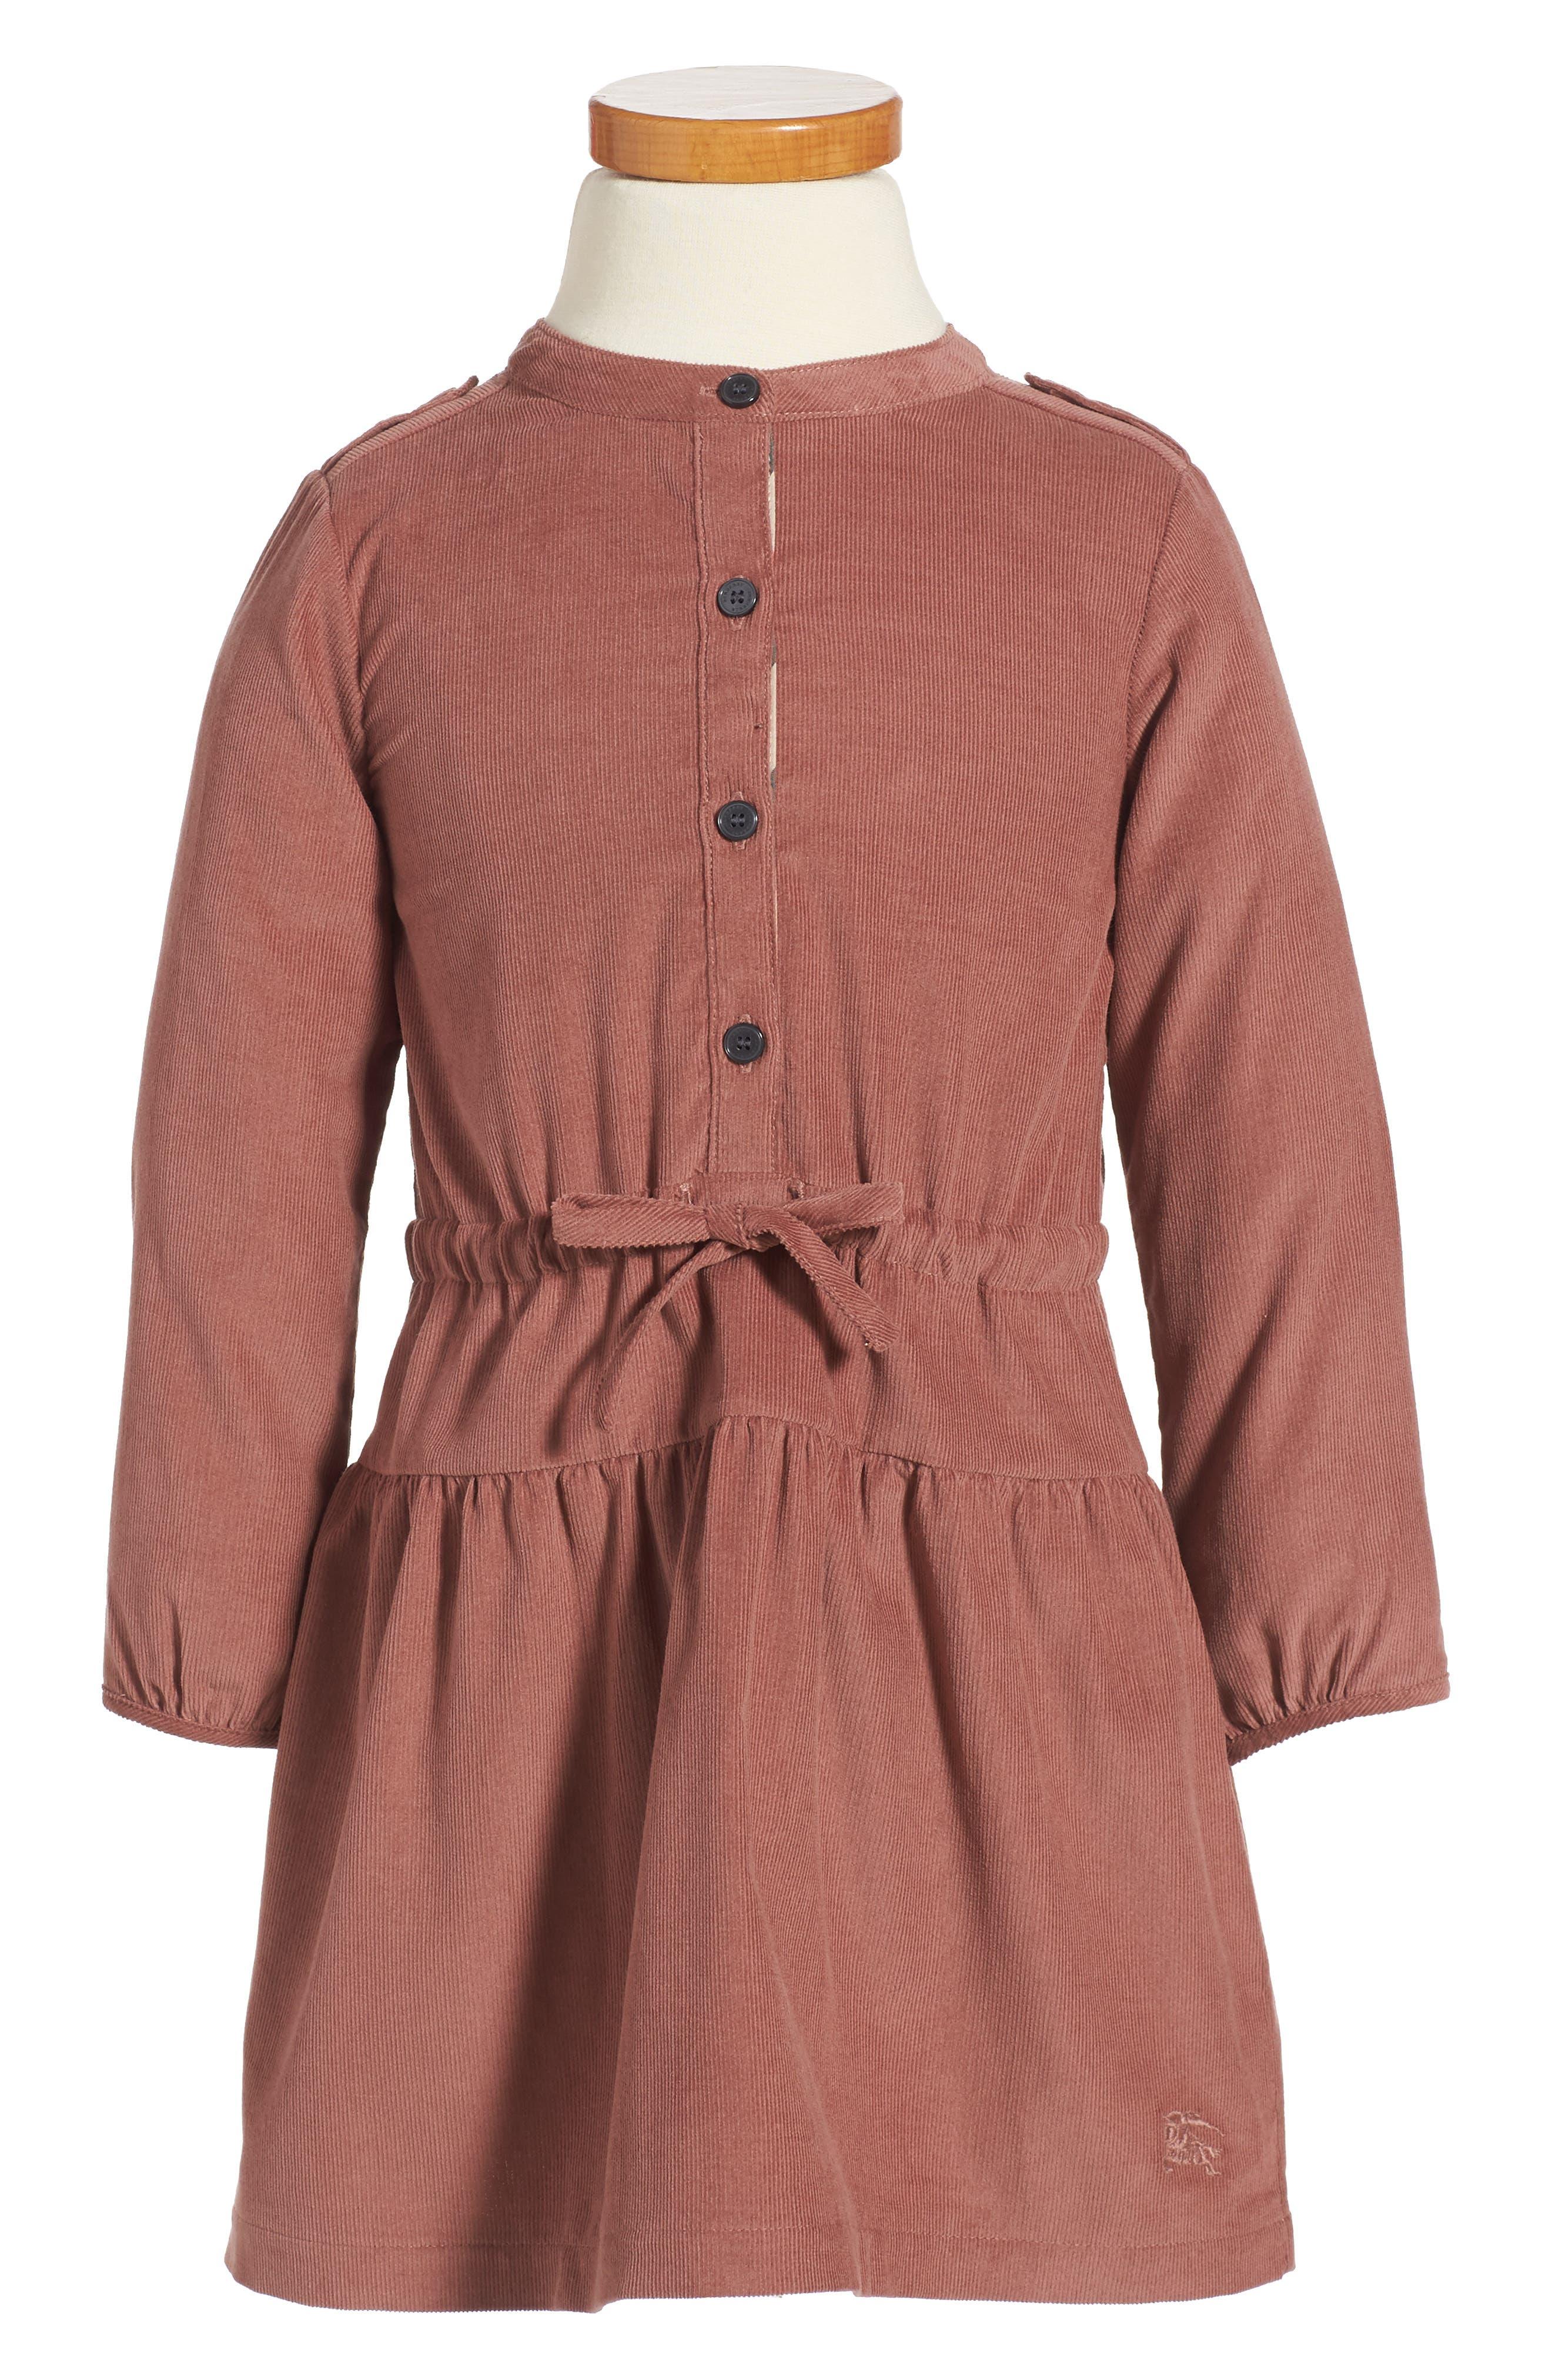 Main Image - Burberry Mini Celestine Corduroy Dress (Toddler Girls)